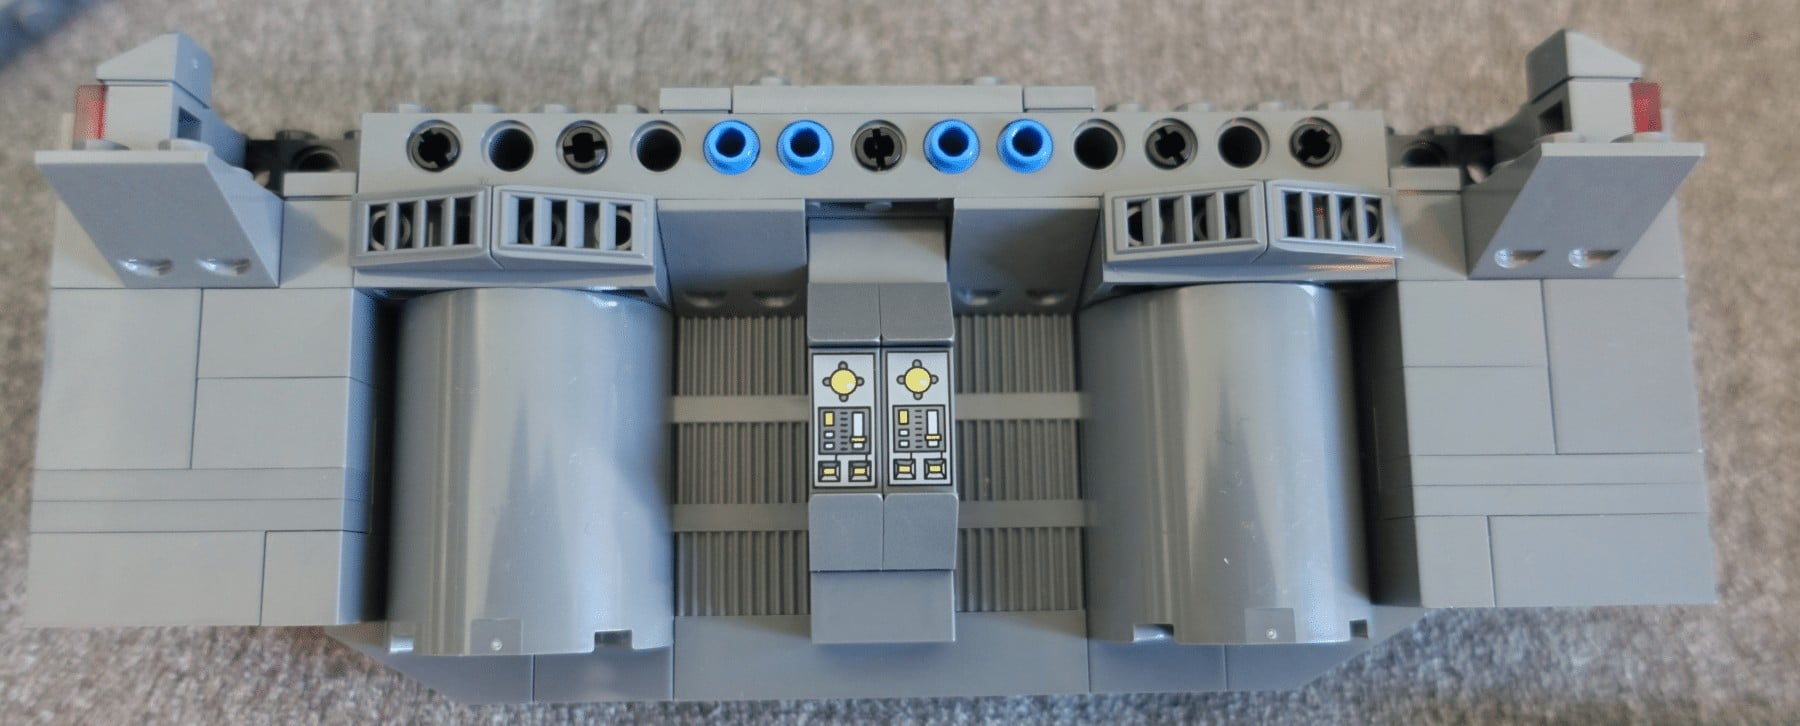 Rückwand des Reaktorraum des LEGO MOC Imperial Star Destroyers